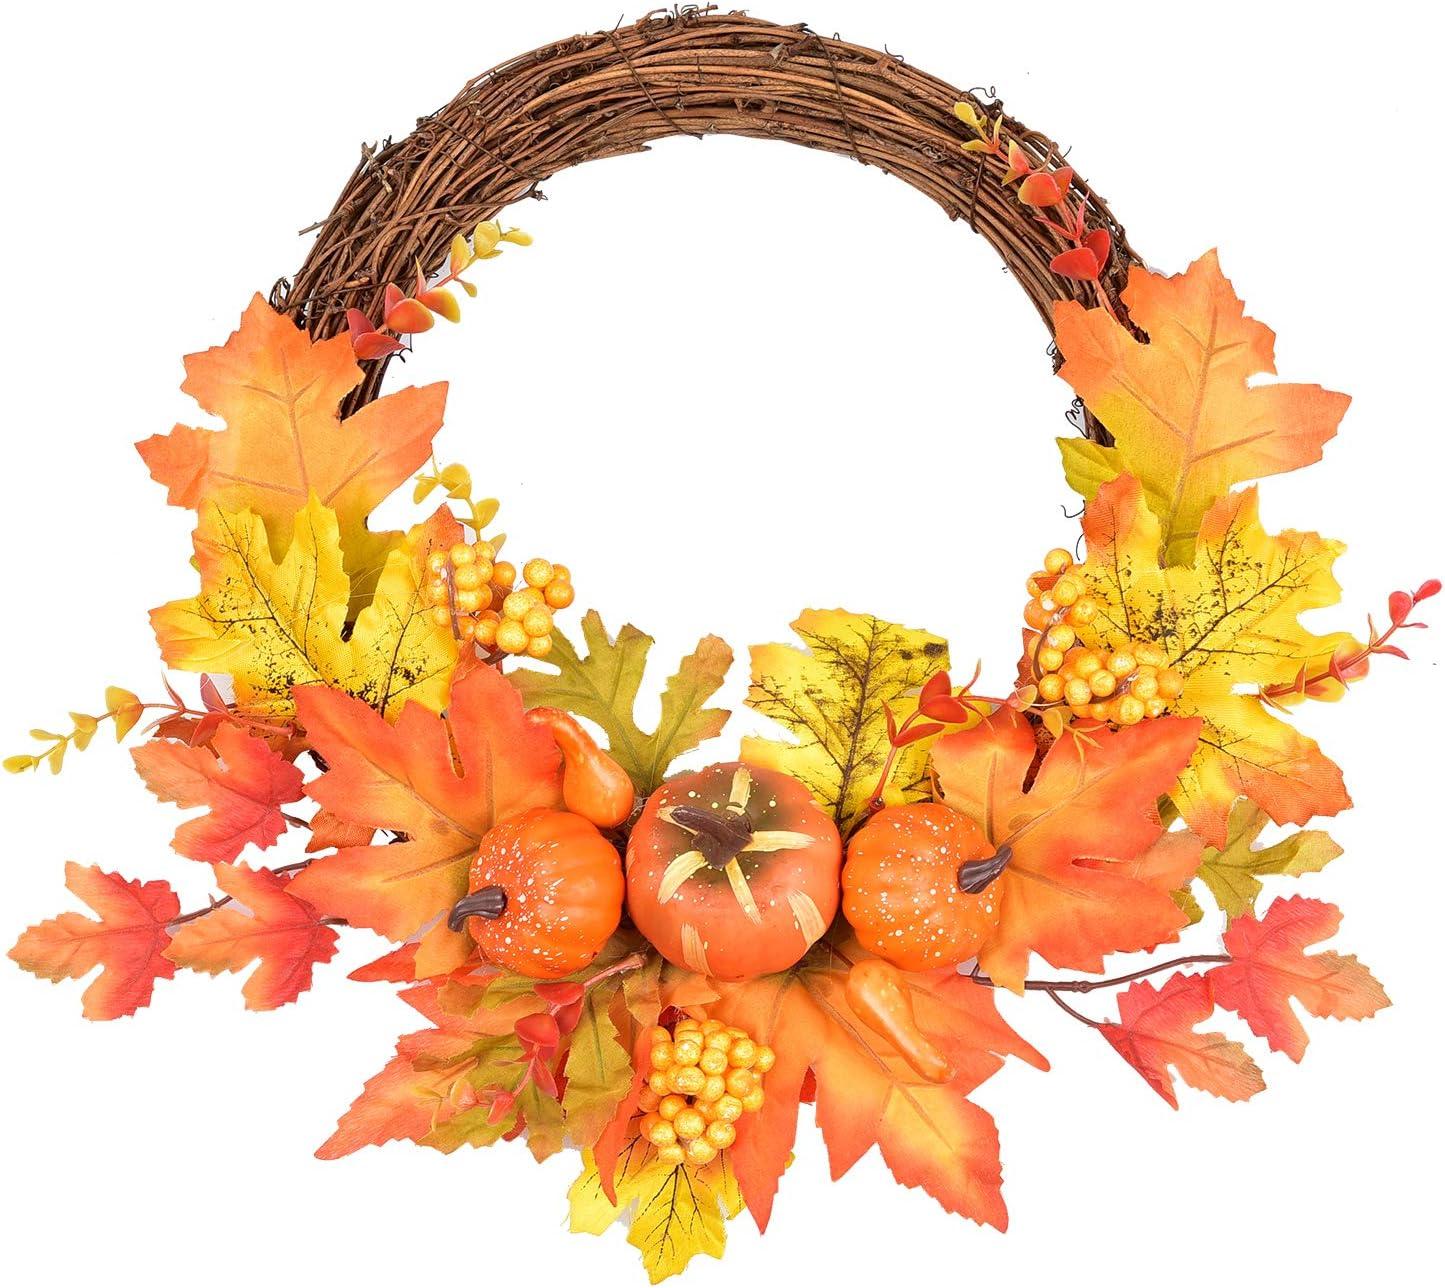 LSKYTOP Artificial Pumpkin Fall Leave Berry Wreath - 10